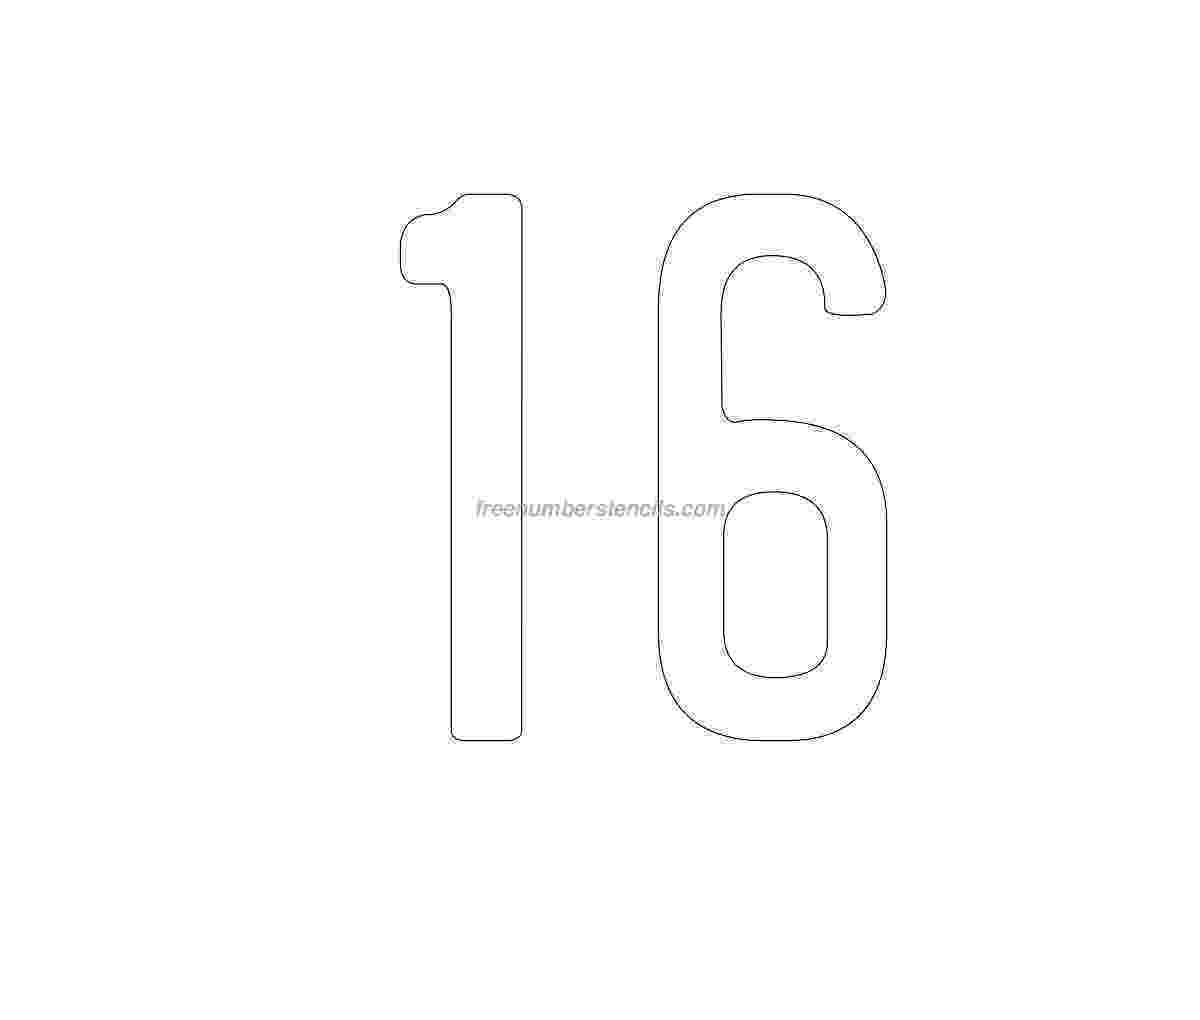 number 16 template number 16 template gallery number 16 template 1 1